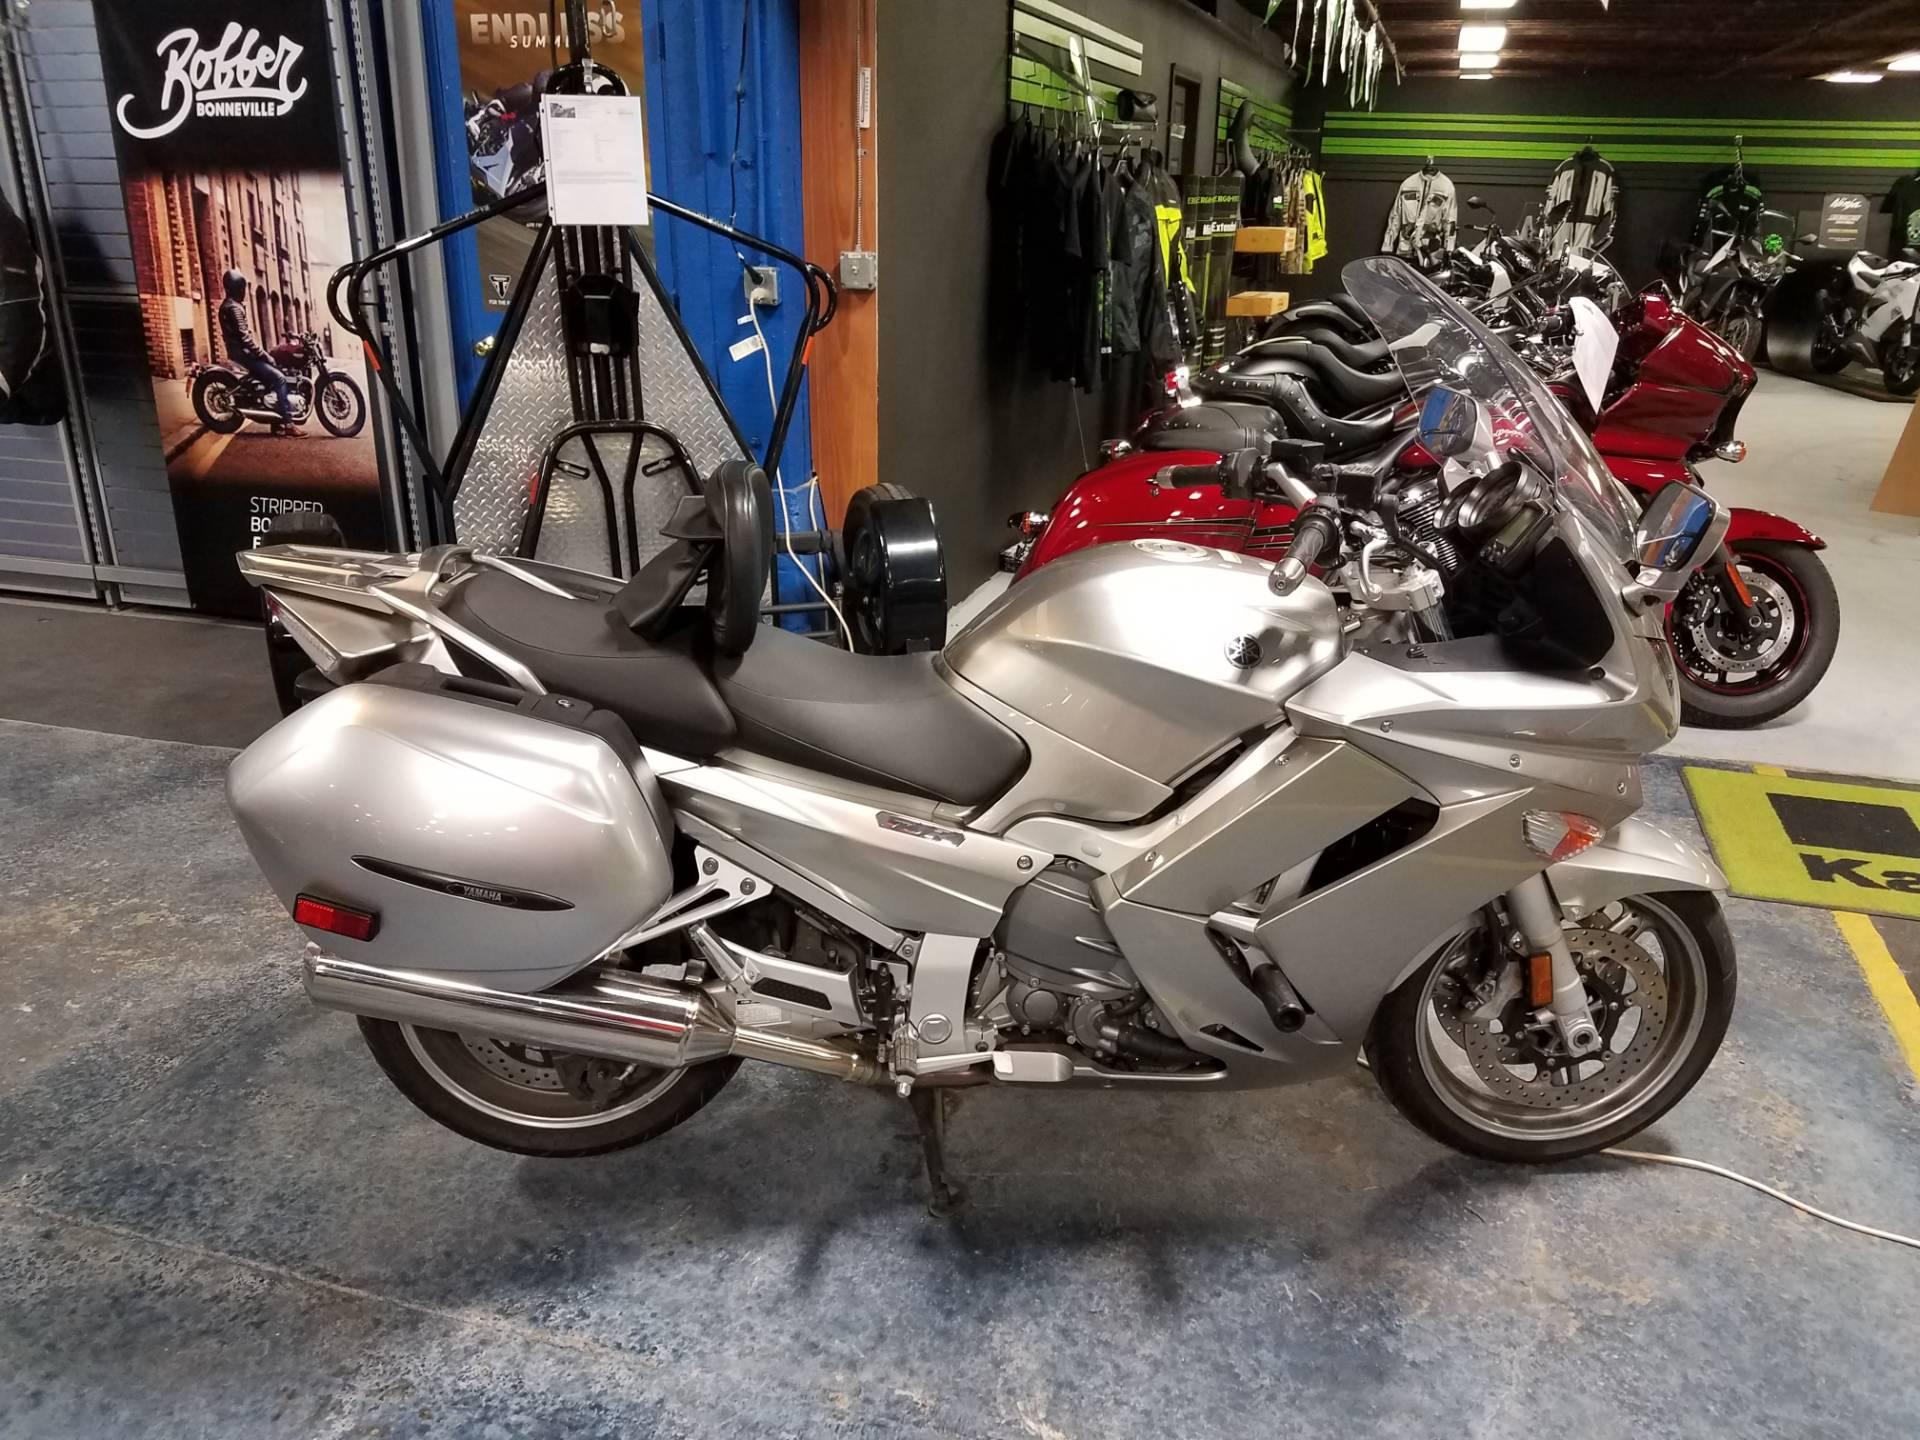 2010 Yamaha FJR1300A 2